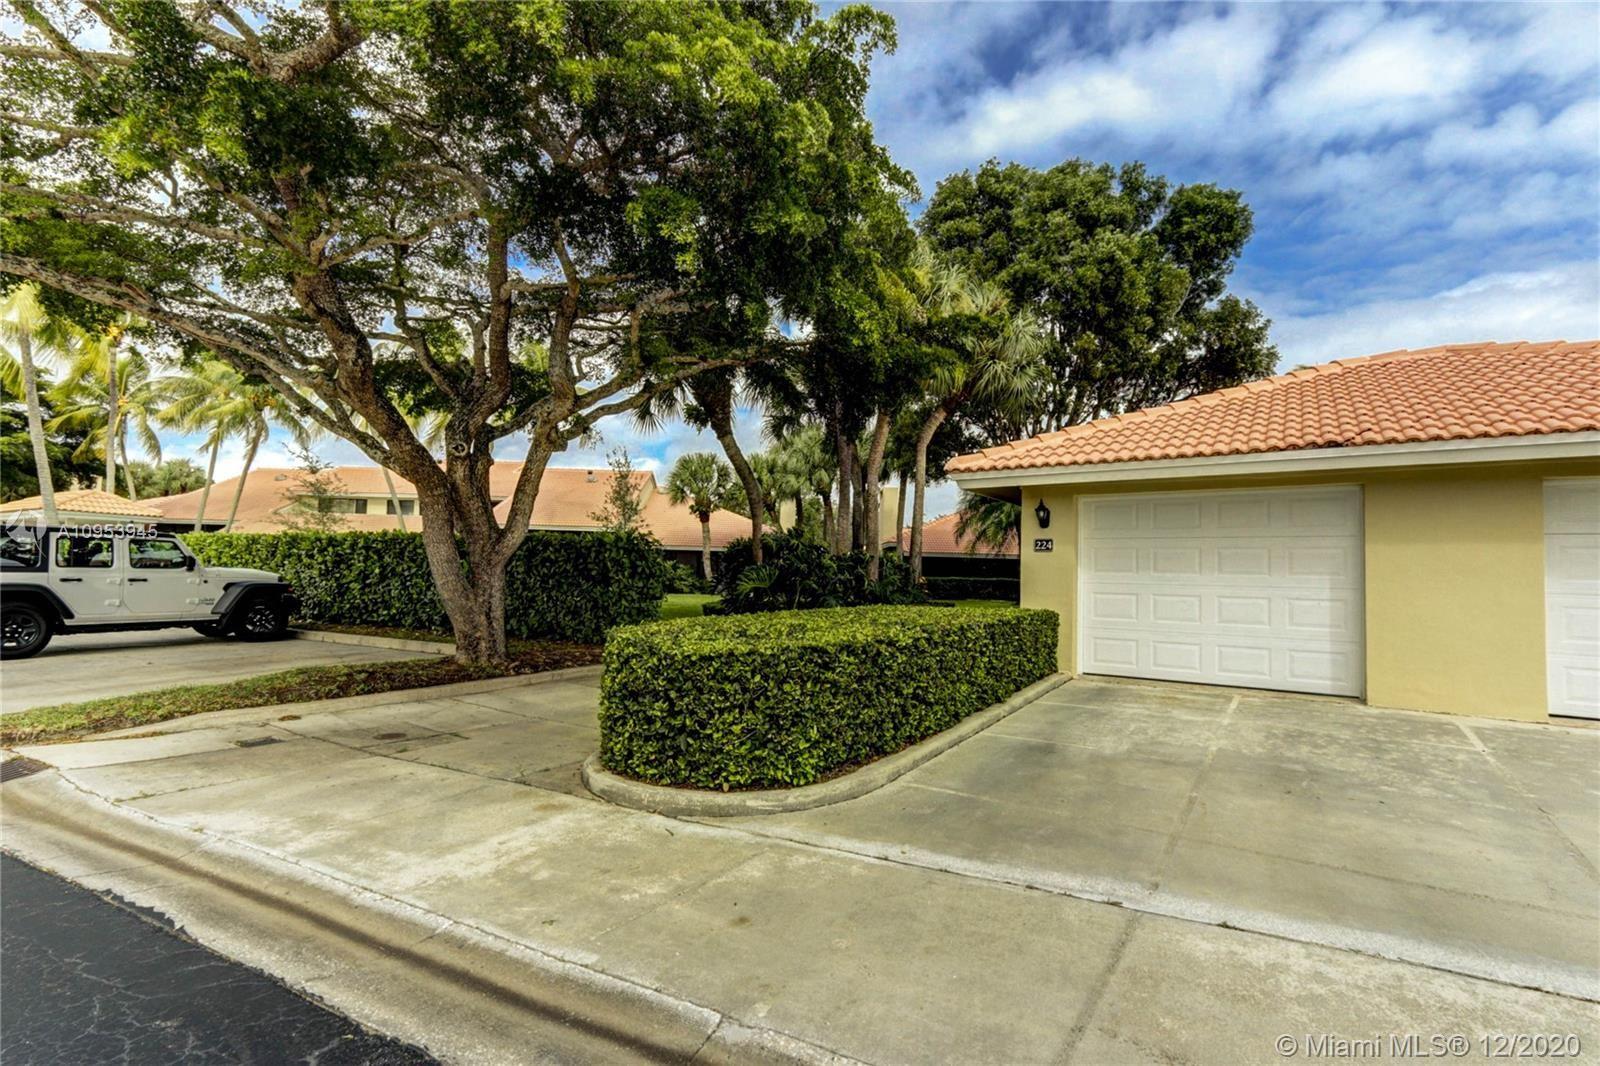 224 Old Meadow Way #1, Palm Beach Gardens, FL 33418 - #: A10953945